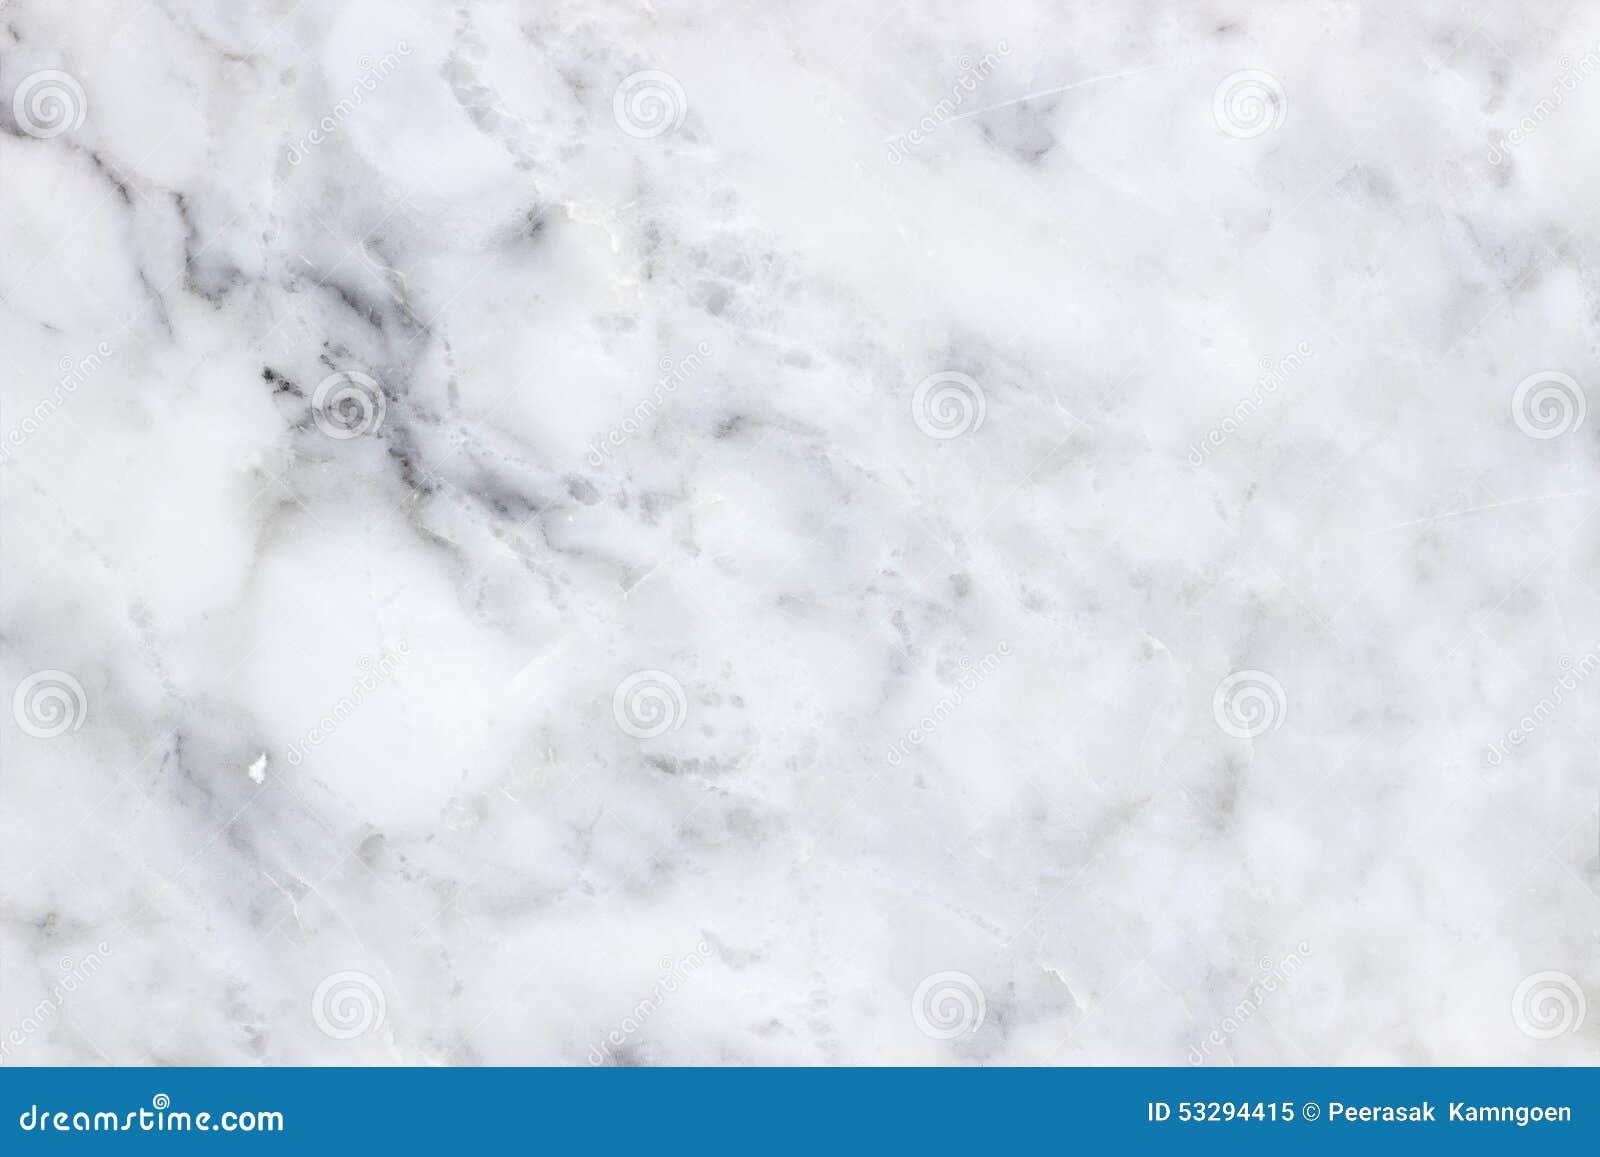 Fondo de m rmol blanco de la textura stock de ilustraci n for Textura de marmol blanco